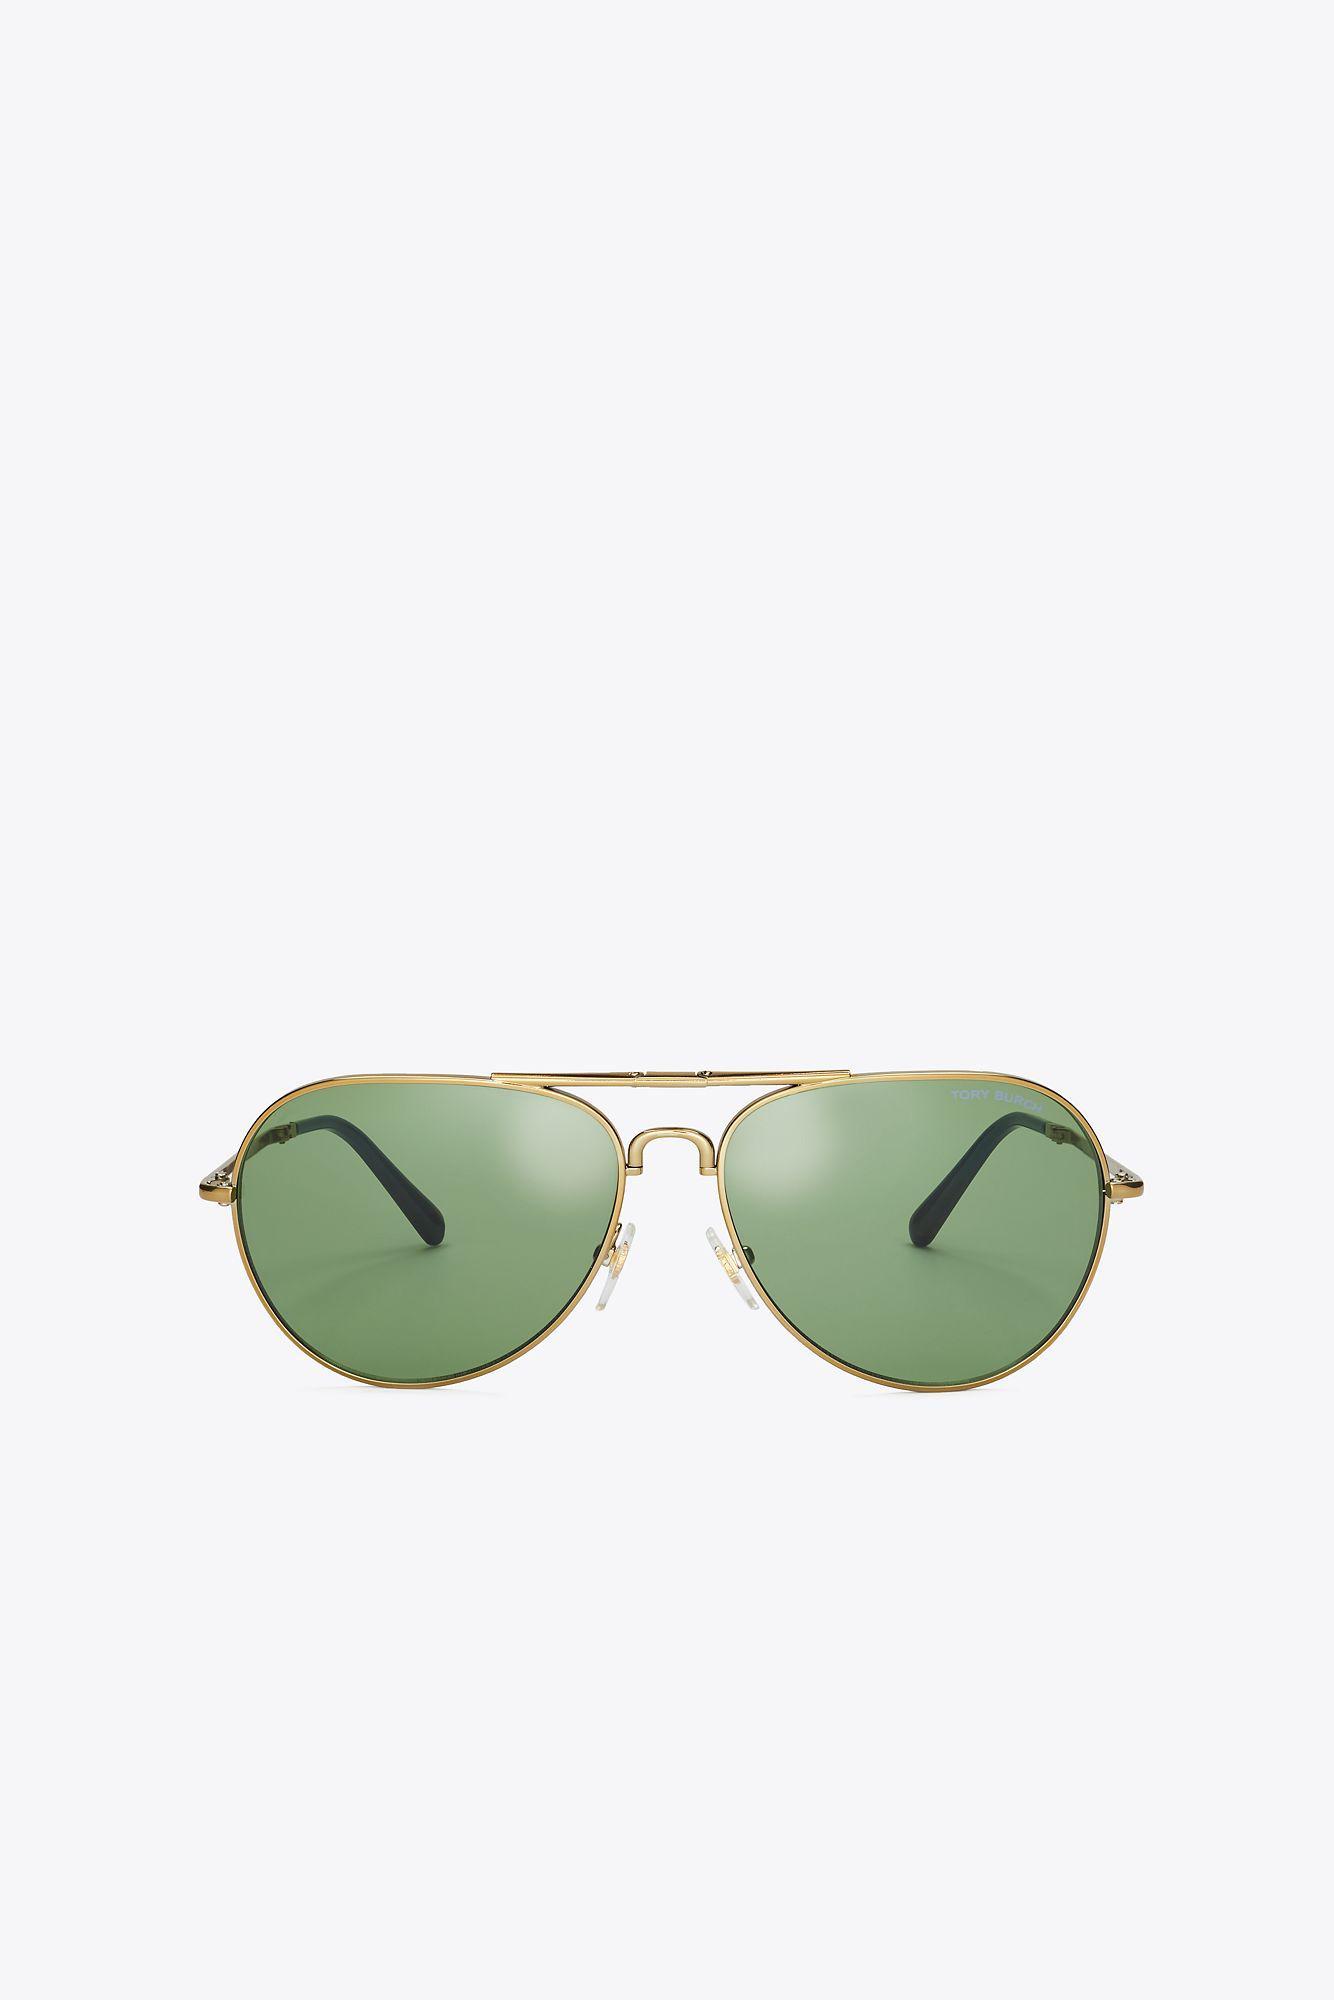 c30b53ba8106 Lyst - Tory Burch Foldable Pilot Sunglasses in Metallic